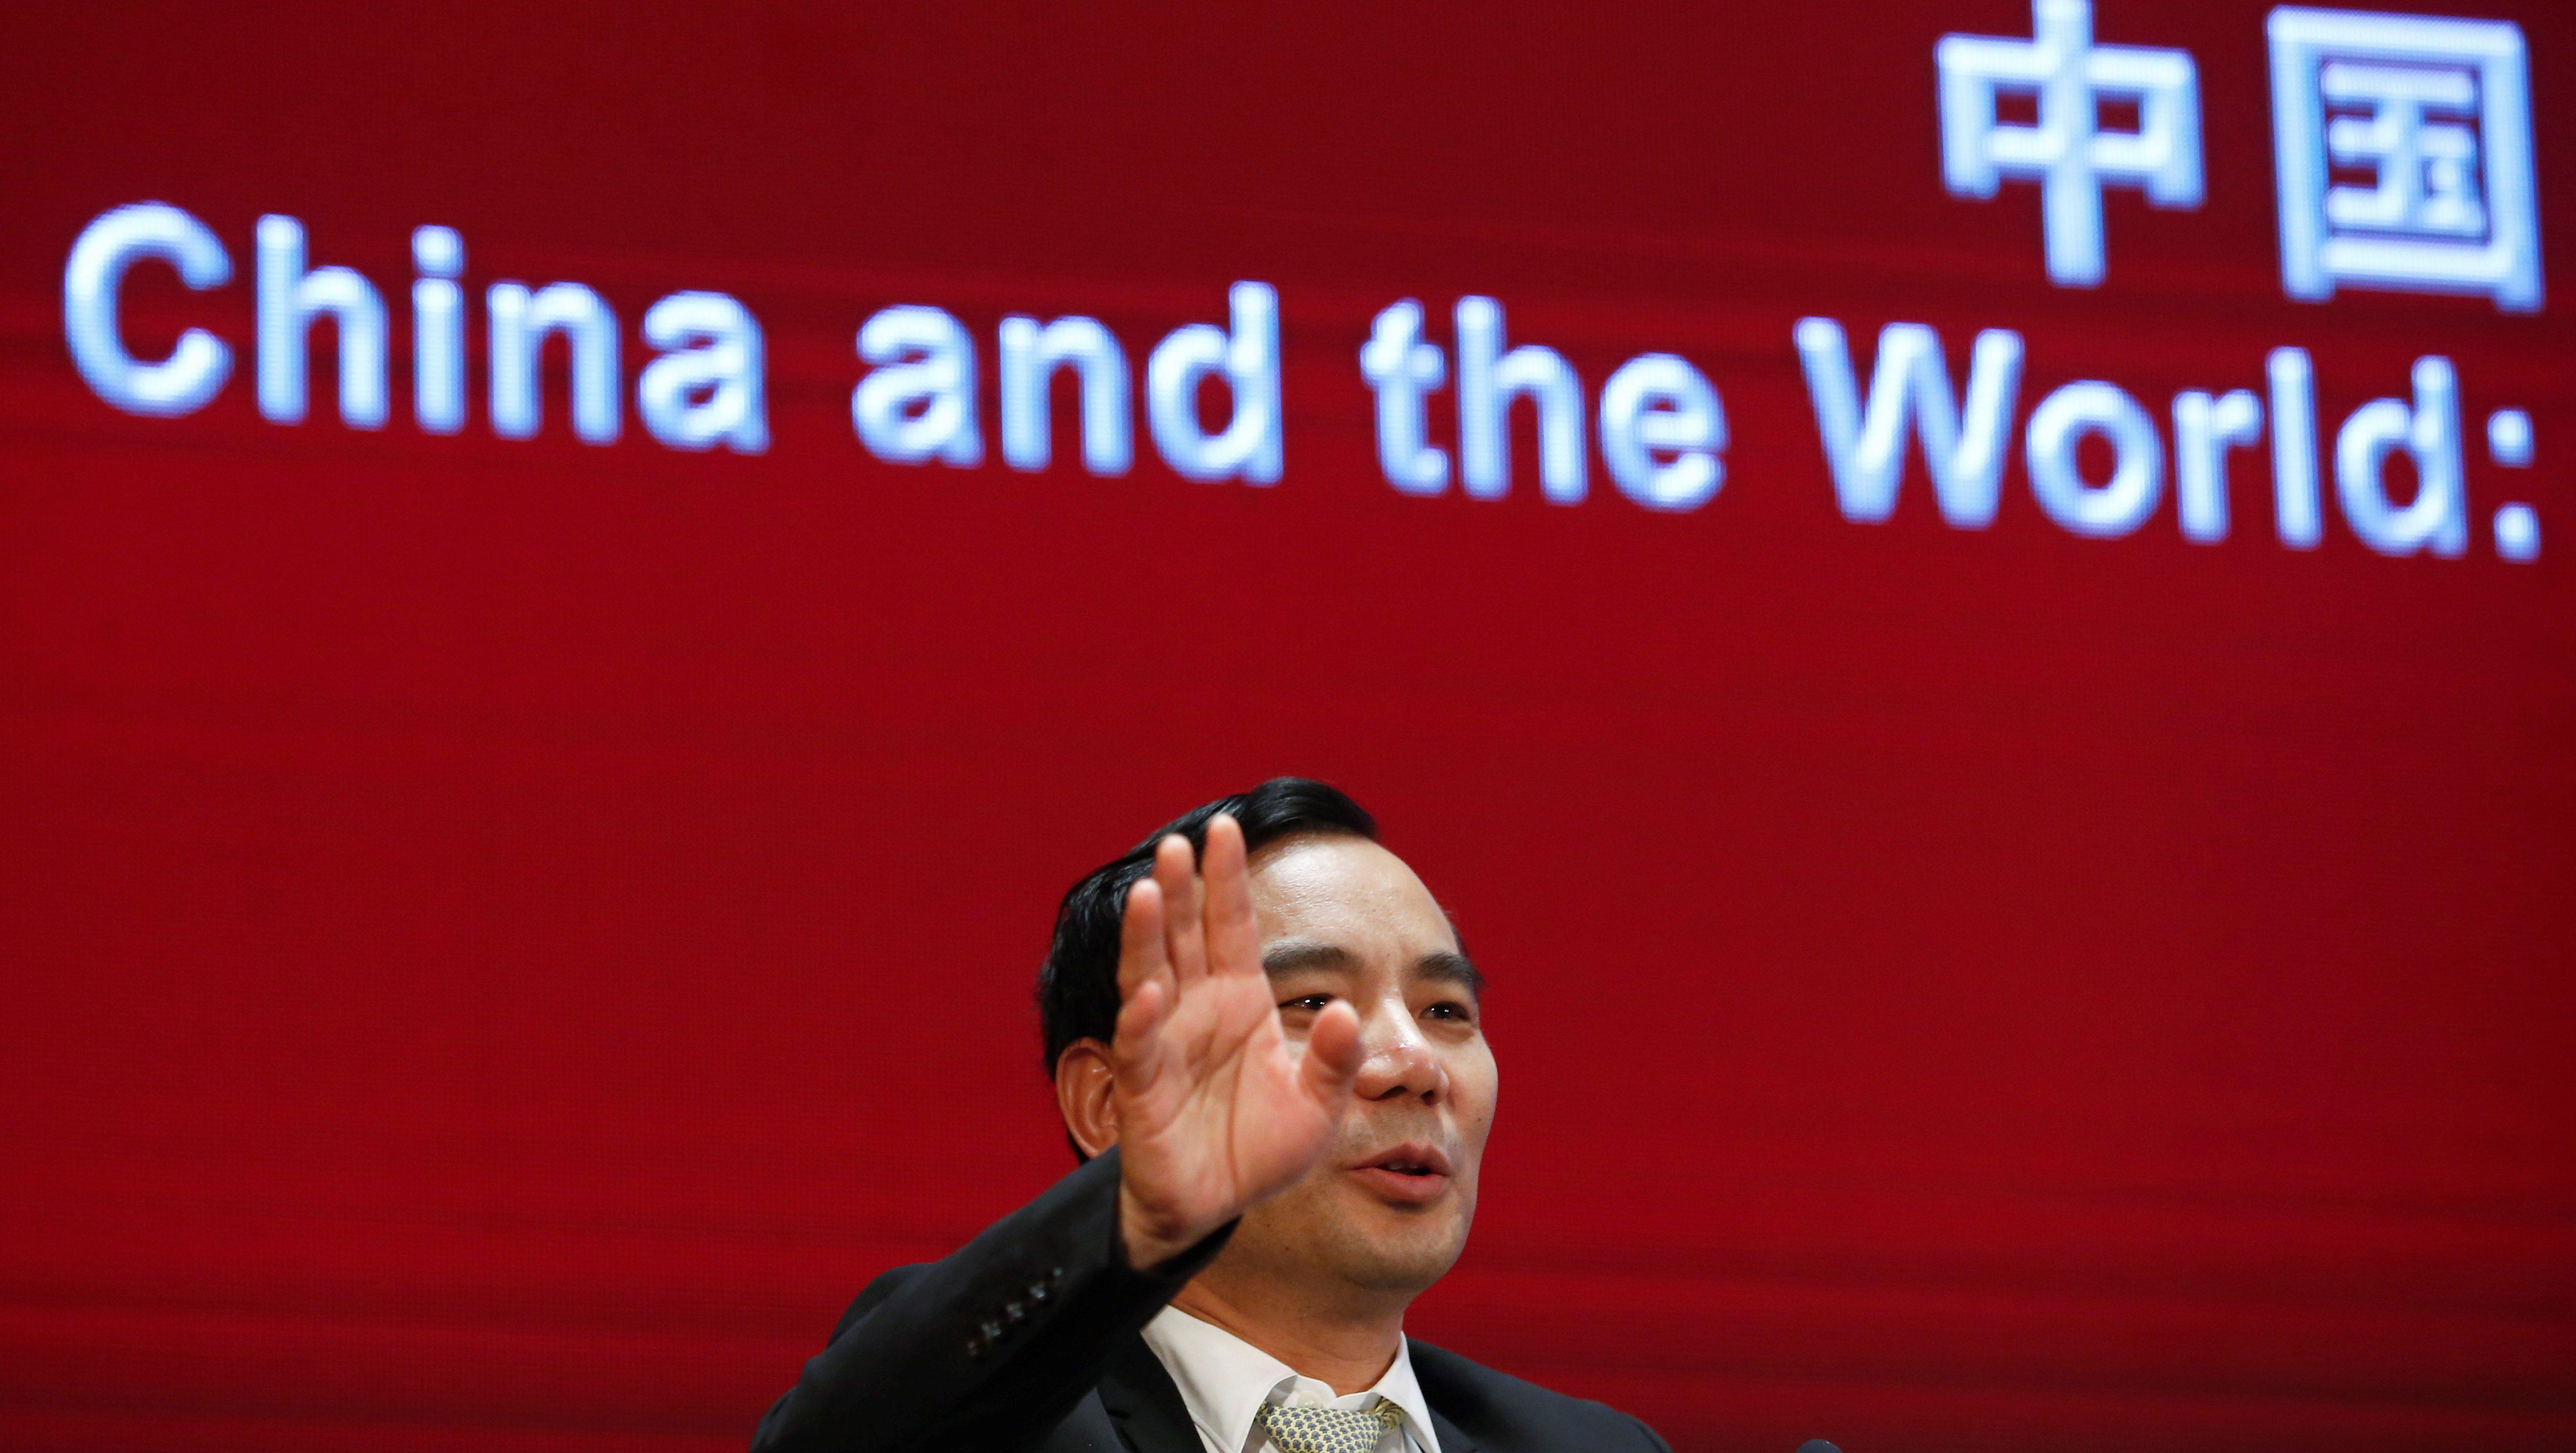 Chairman of Anbang Insurance Group Wu Xiaohui attends the China Development Forum in Beijing, China, March 18, 2017.